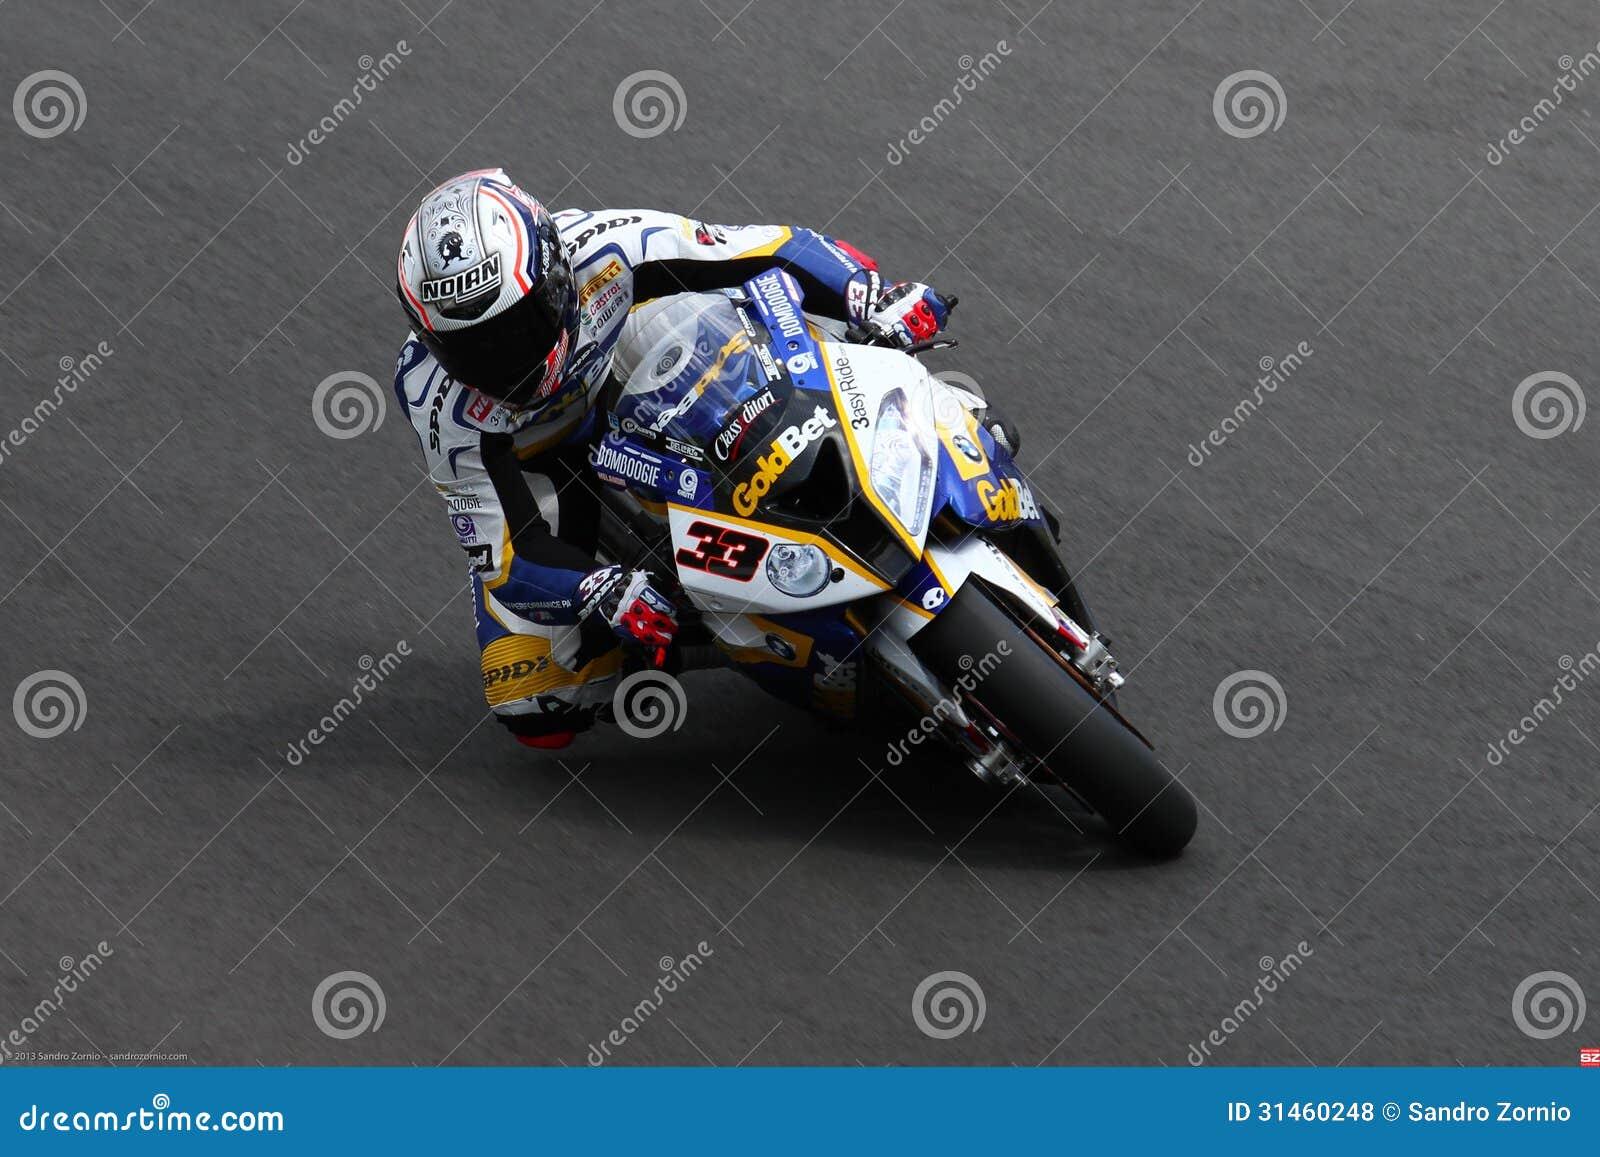 Marco Melandri #33 on BMW S1000 RR with BMW Motorrad GoldBet SBK Team Superbike WSBK